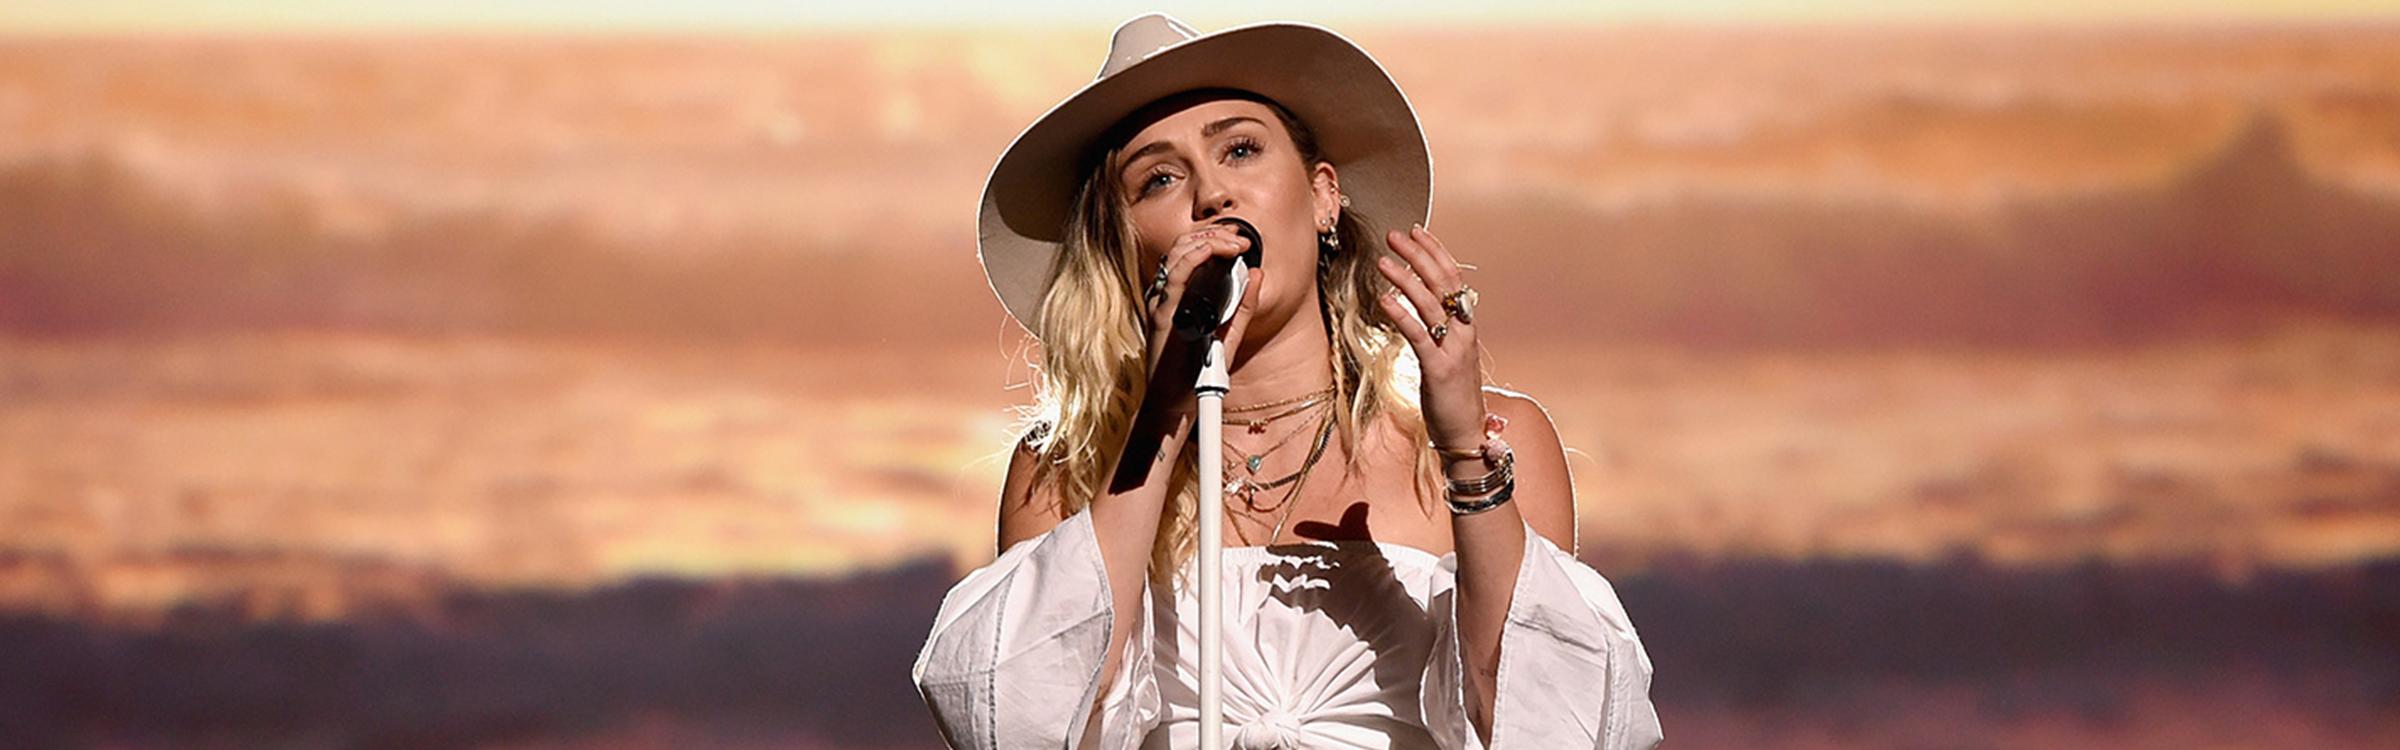 Mileyklaar